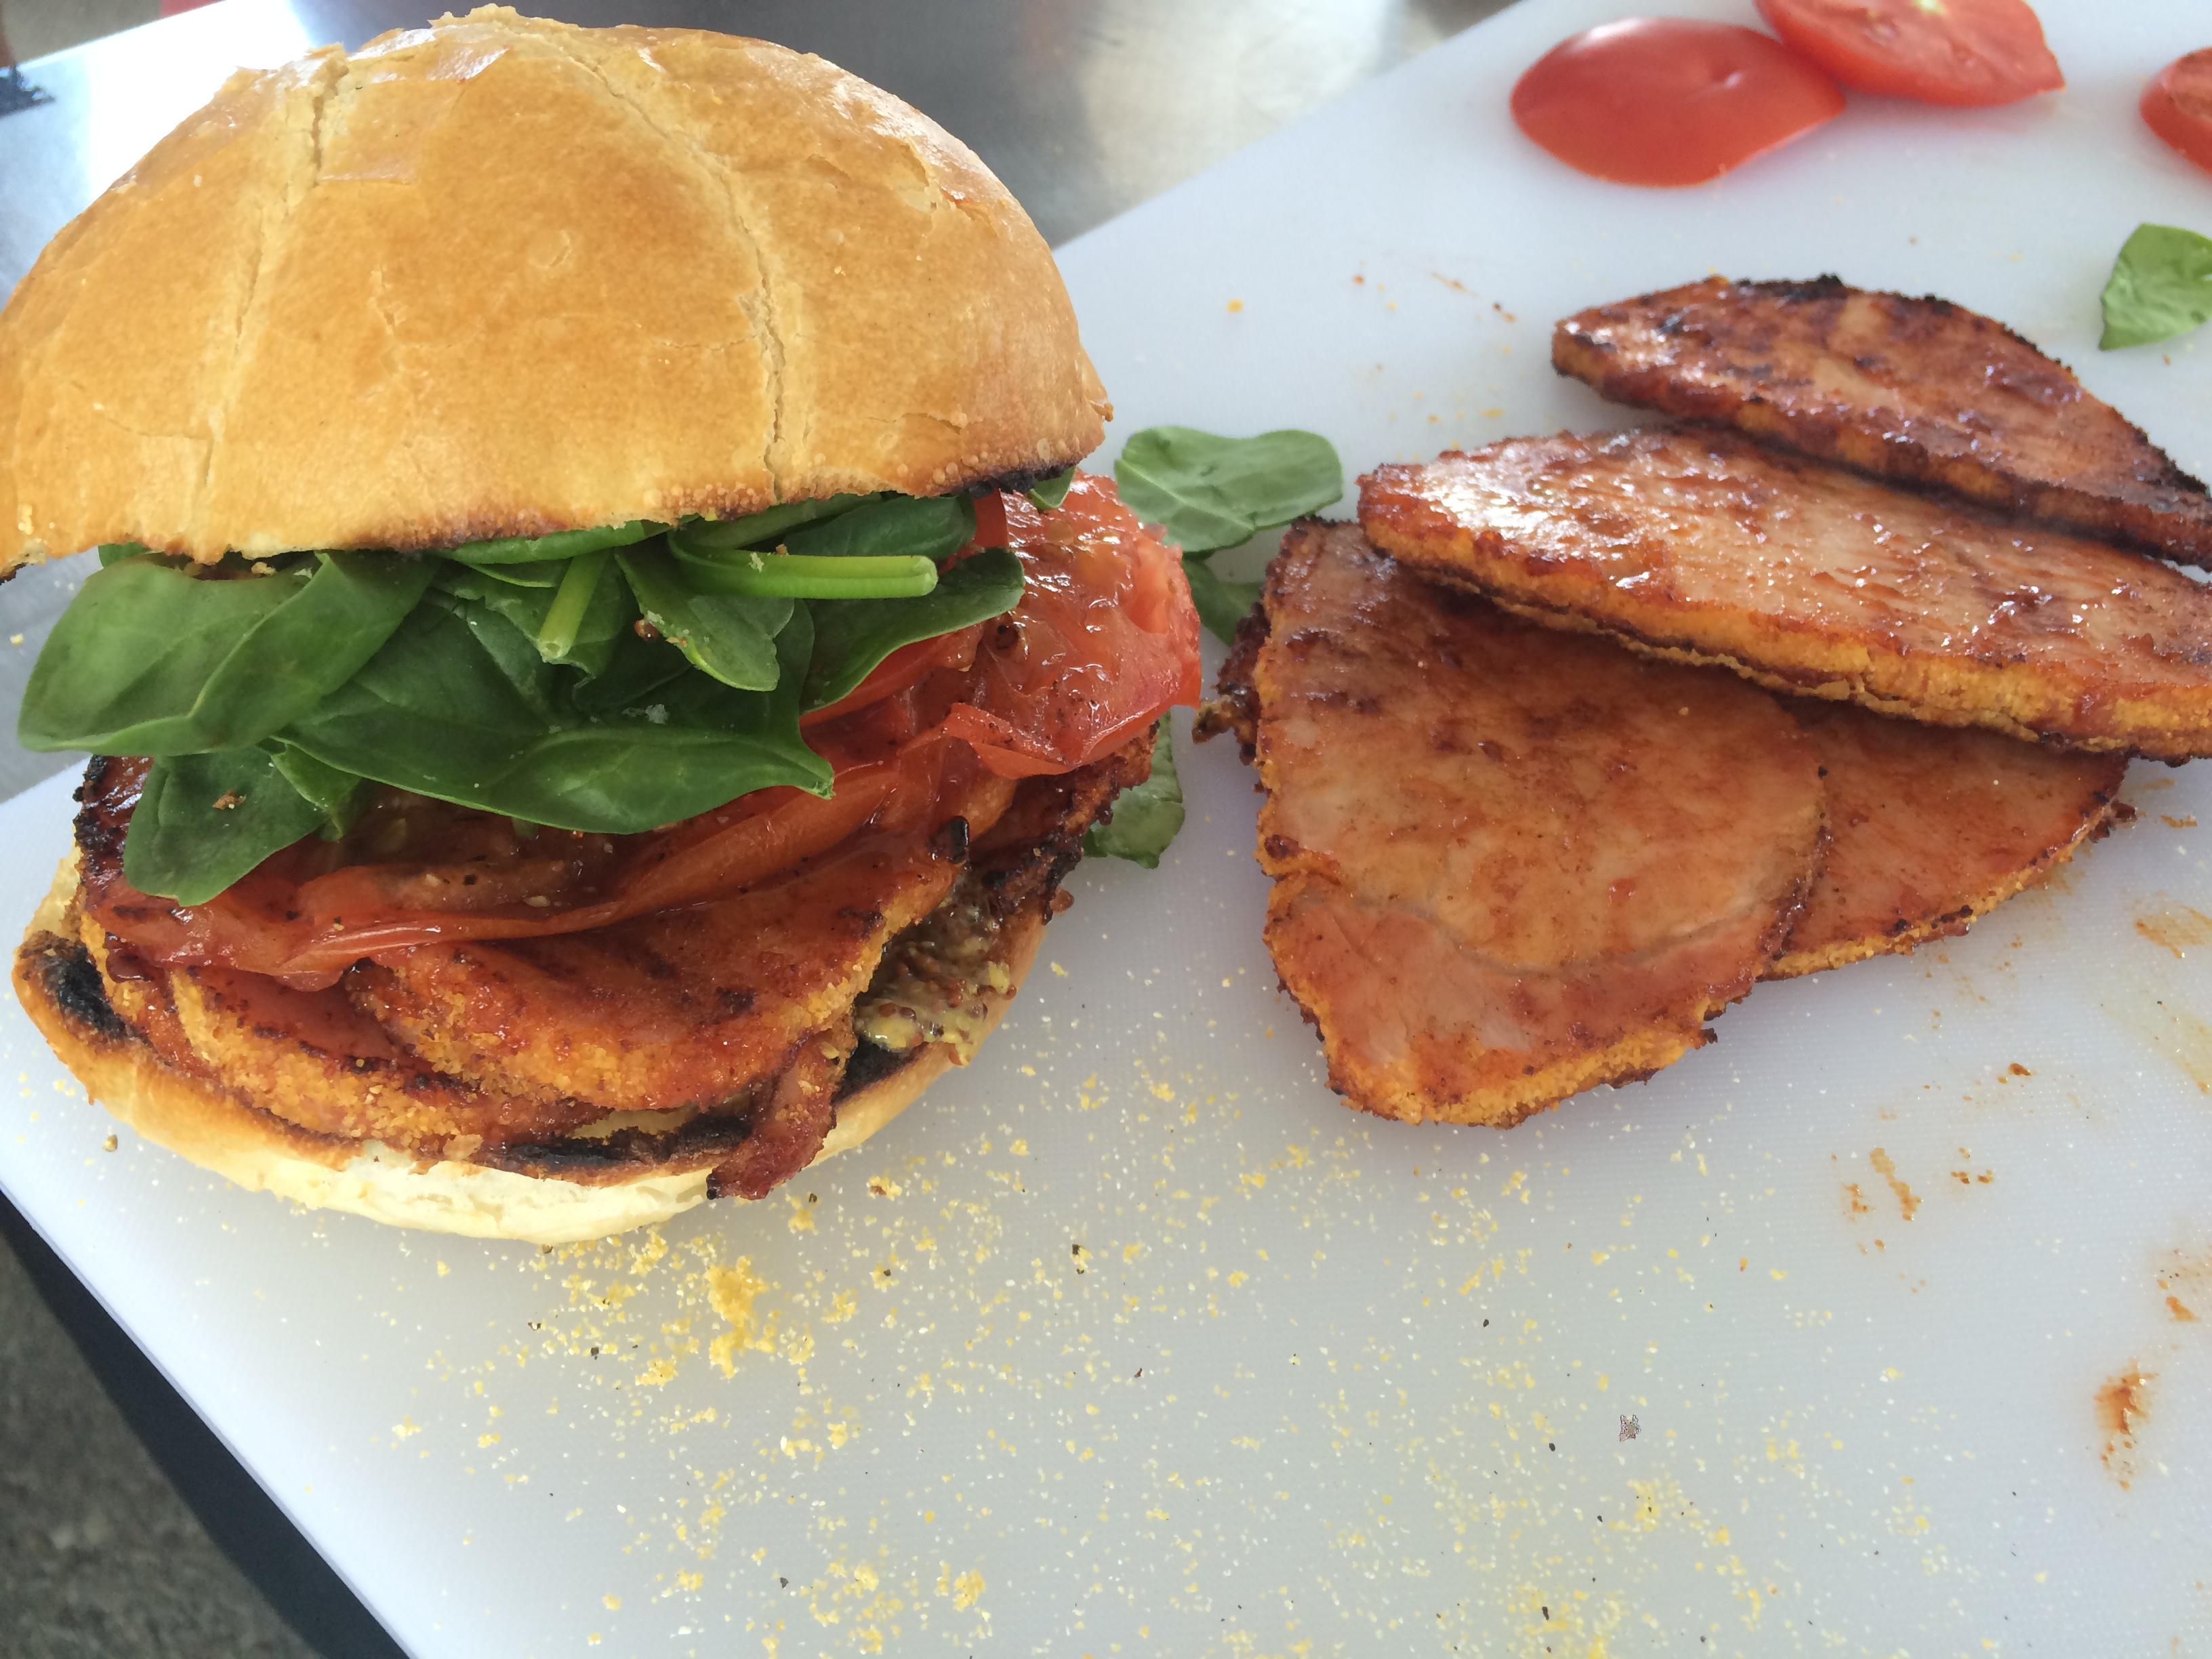 Chef Cowan's Peameal Bacon Sandwiches